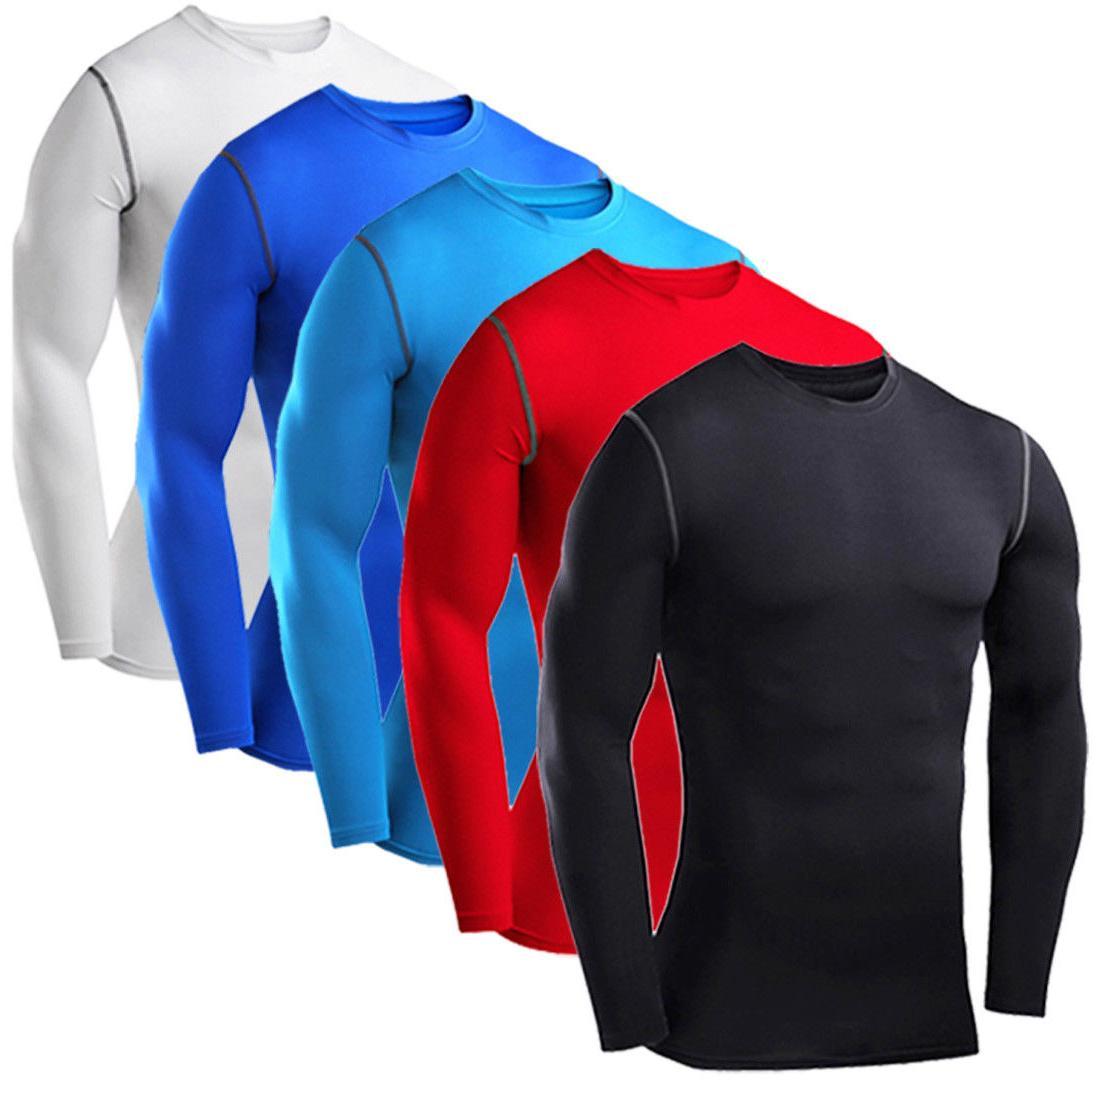 Mens Compression Base Shirt Vest Pants Shorts Gym Running Tights